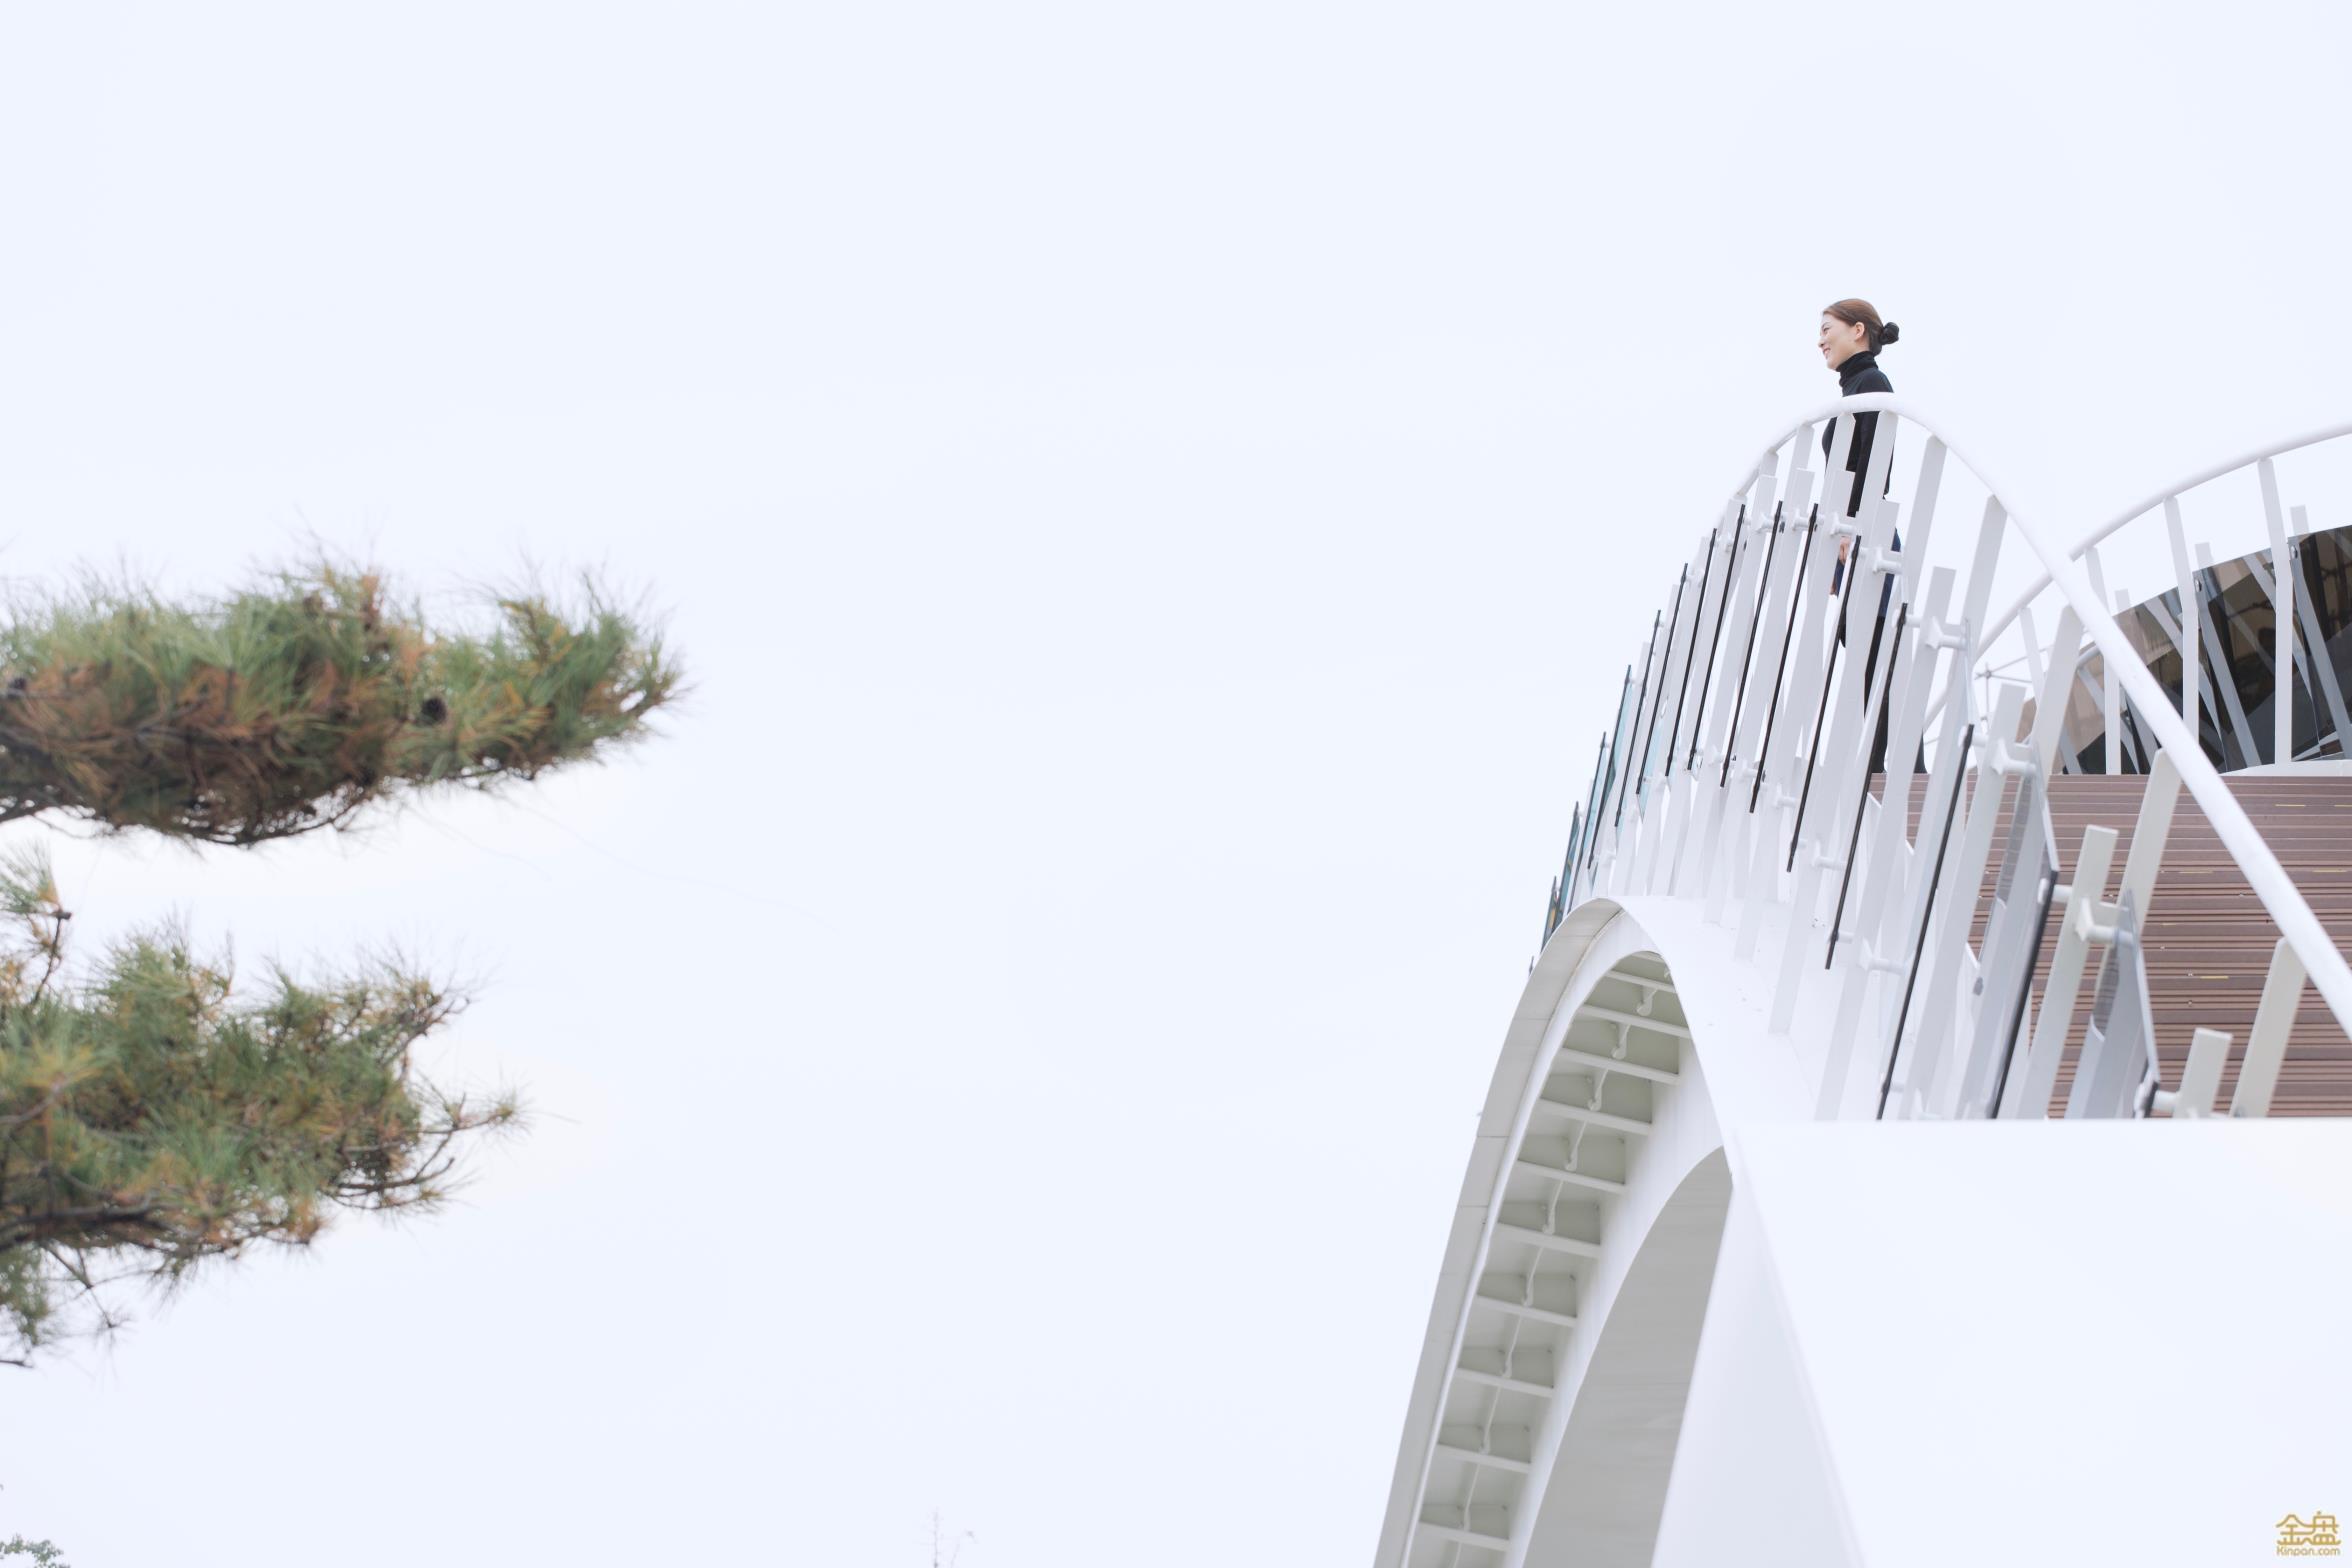 Holi河狸景观摄影-5.jpg